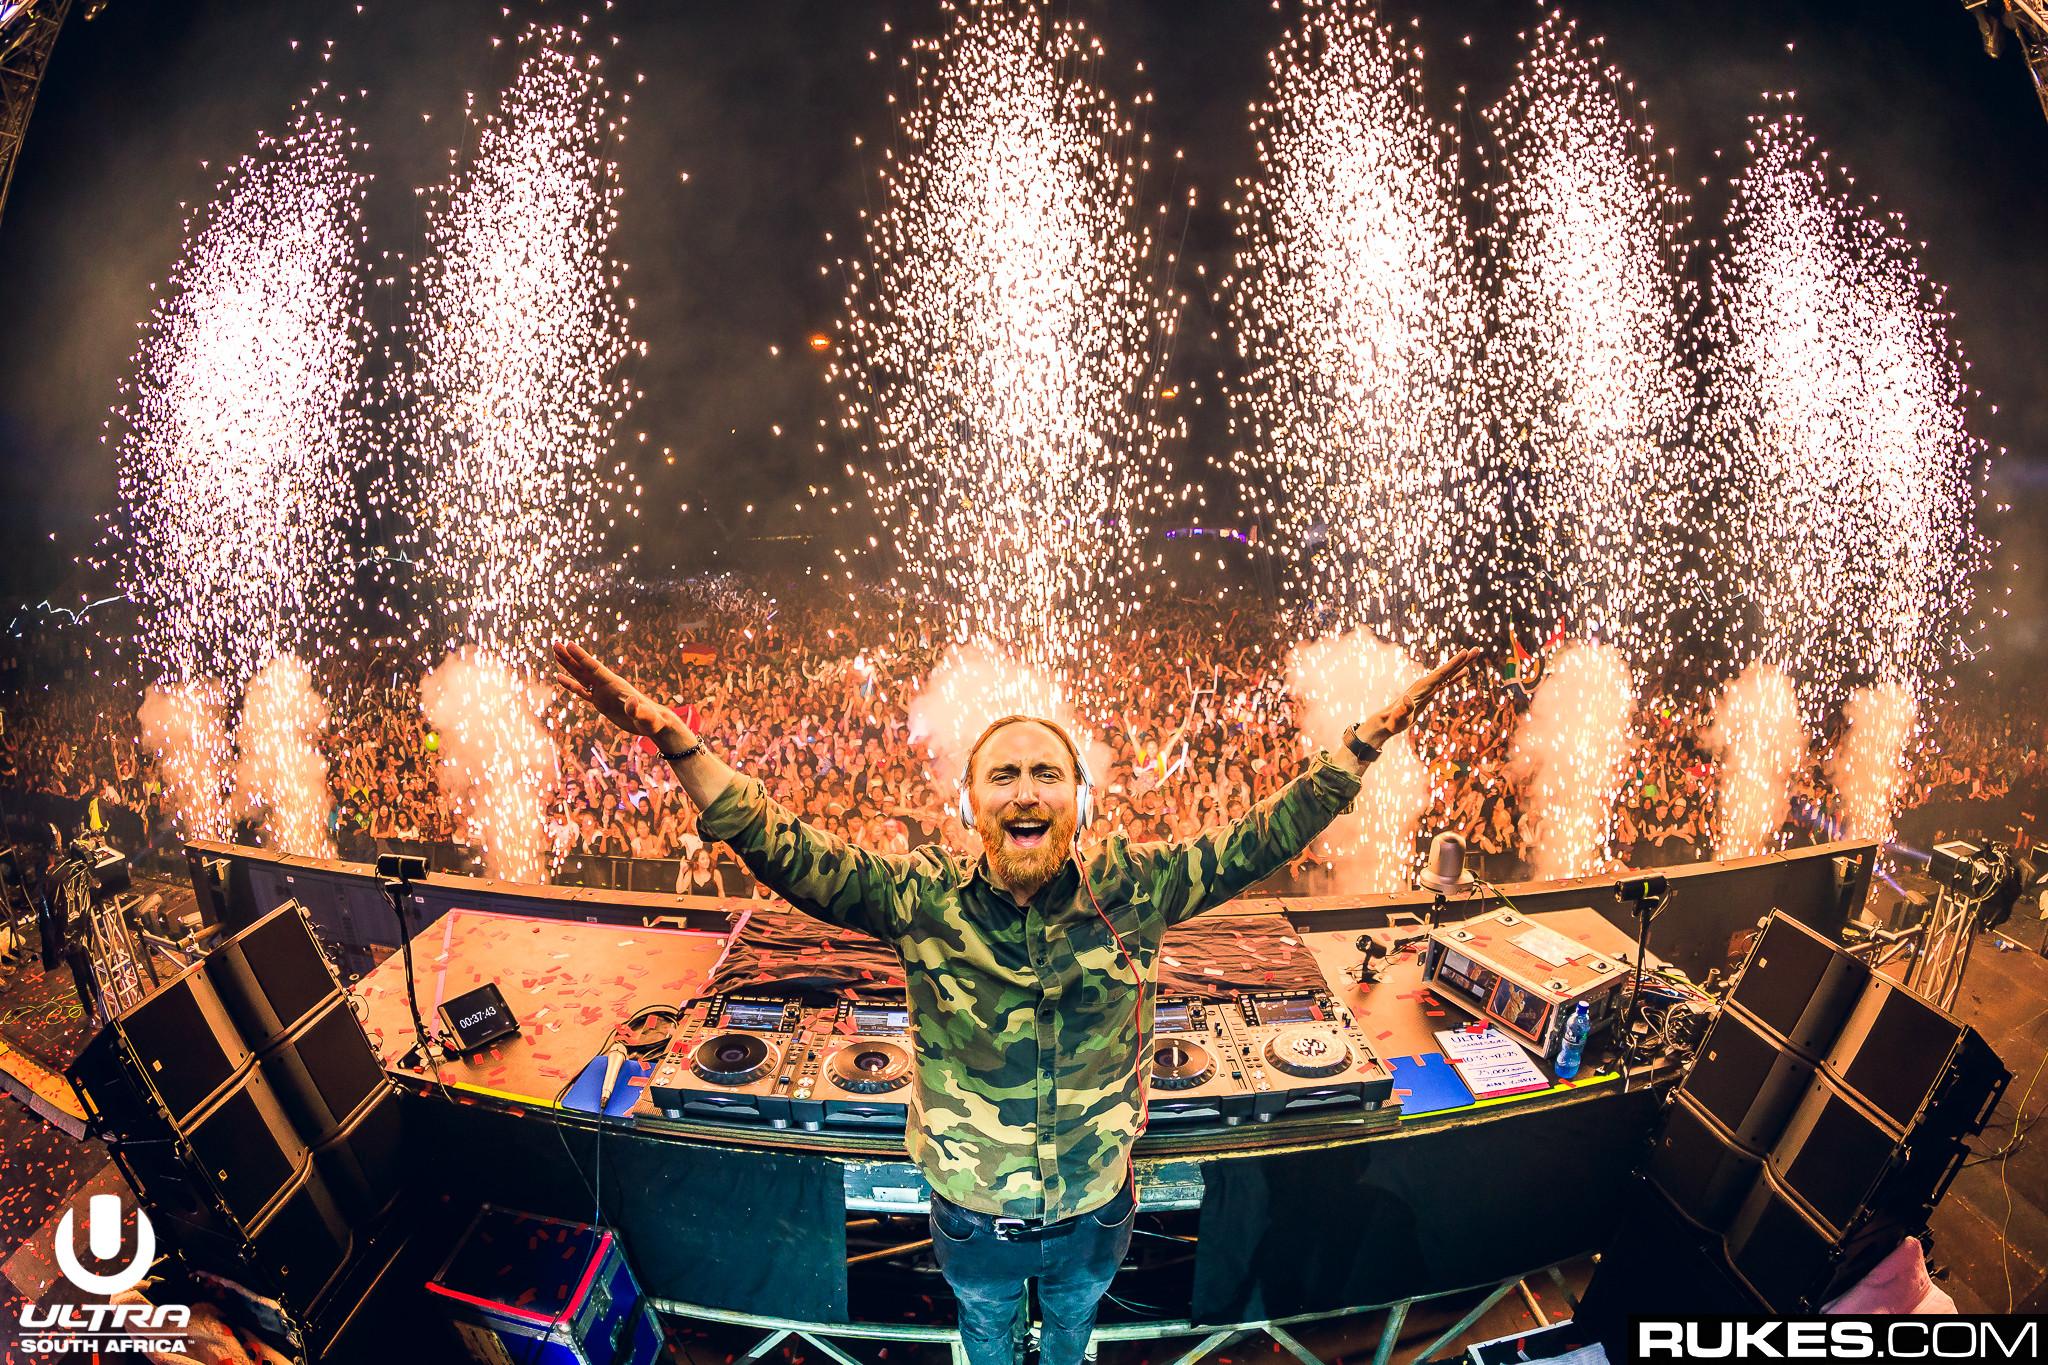 David Guetta Sparks Rukes